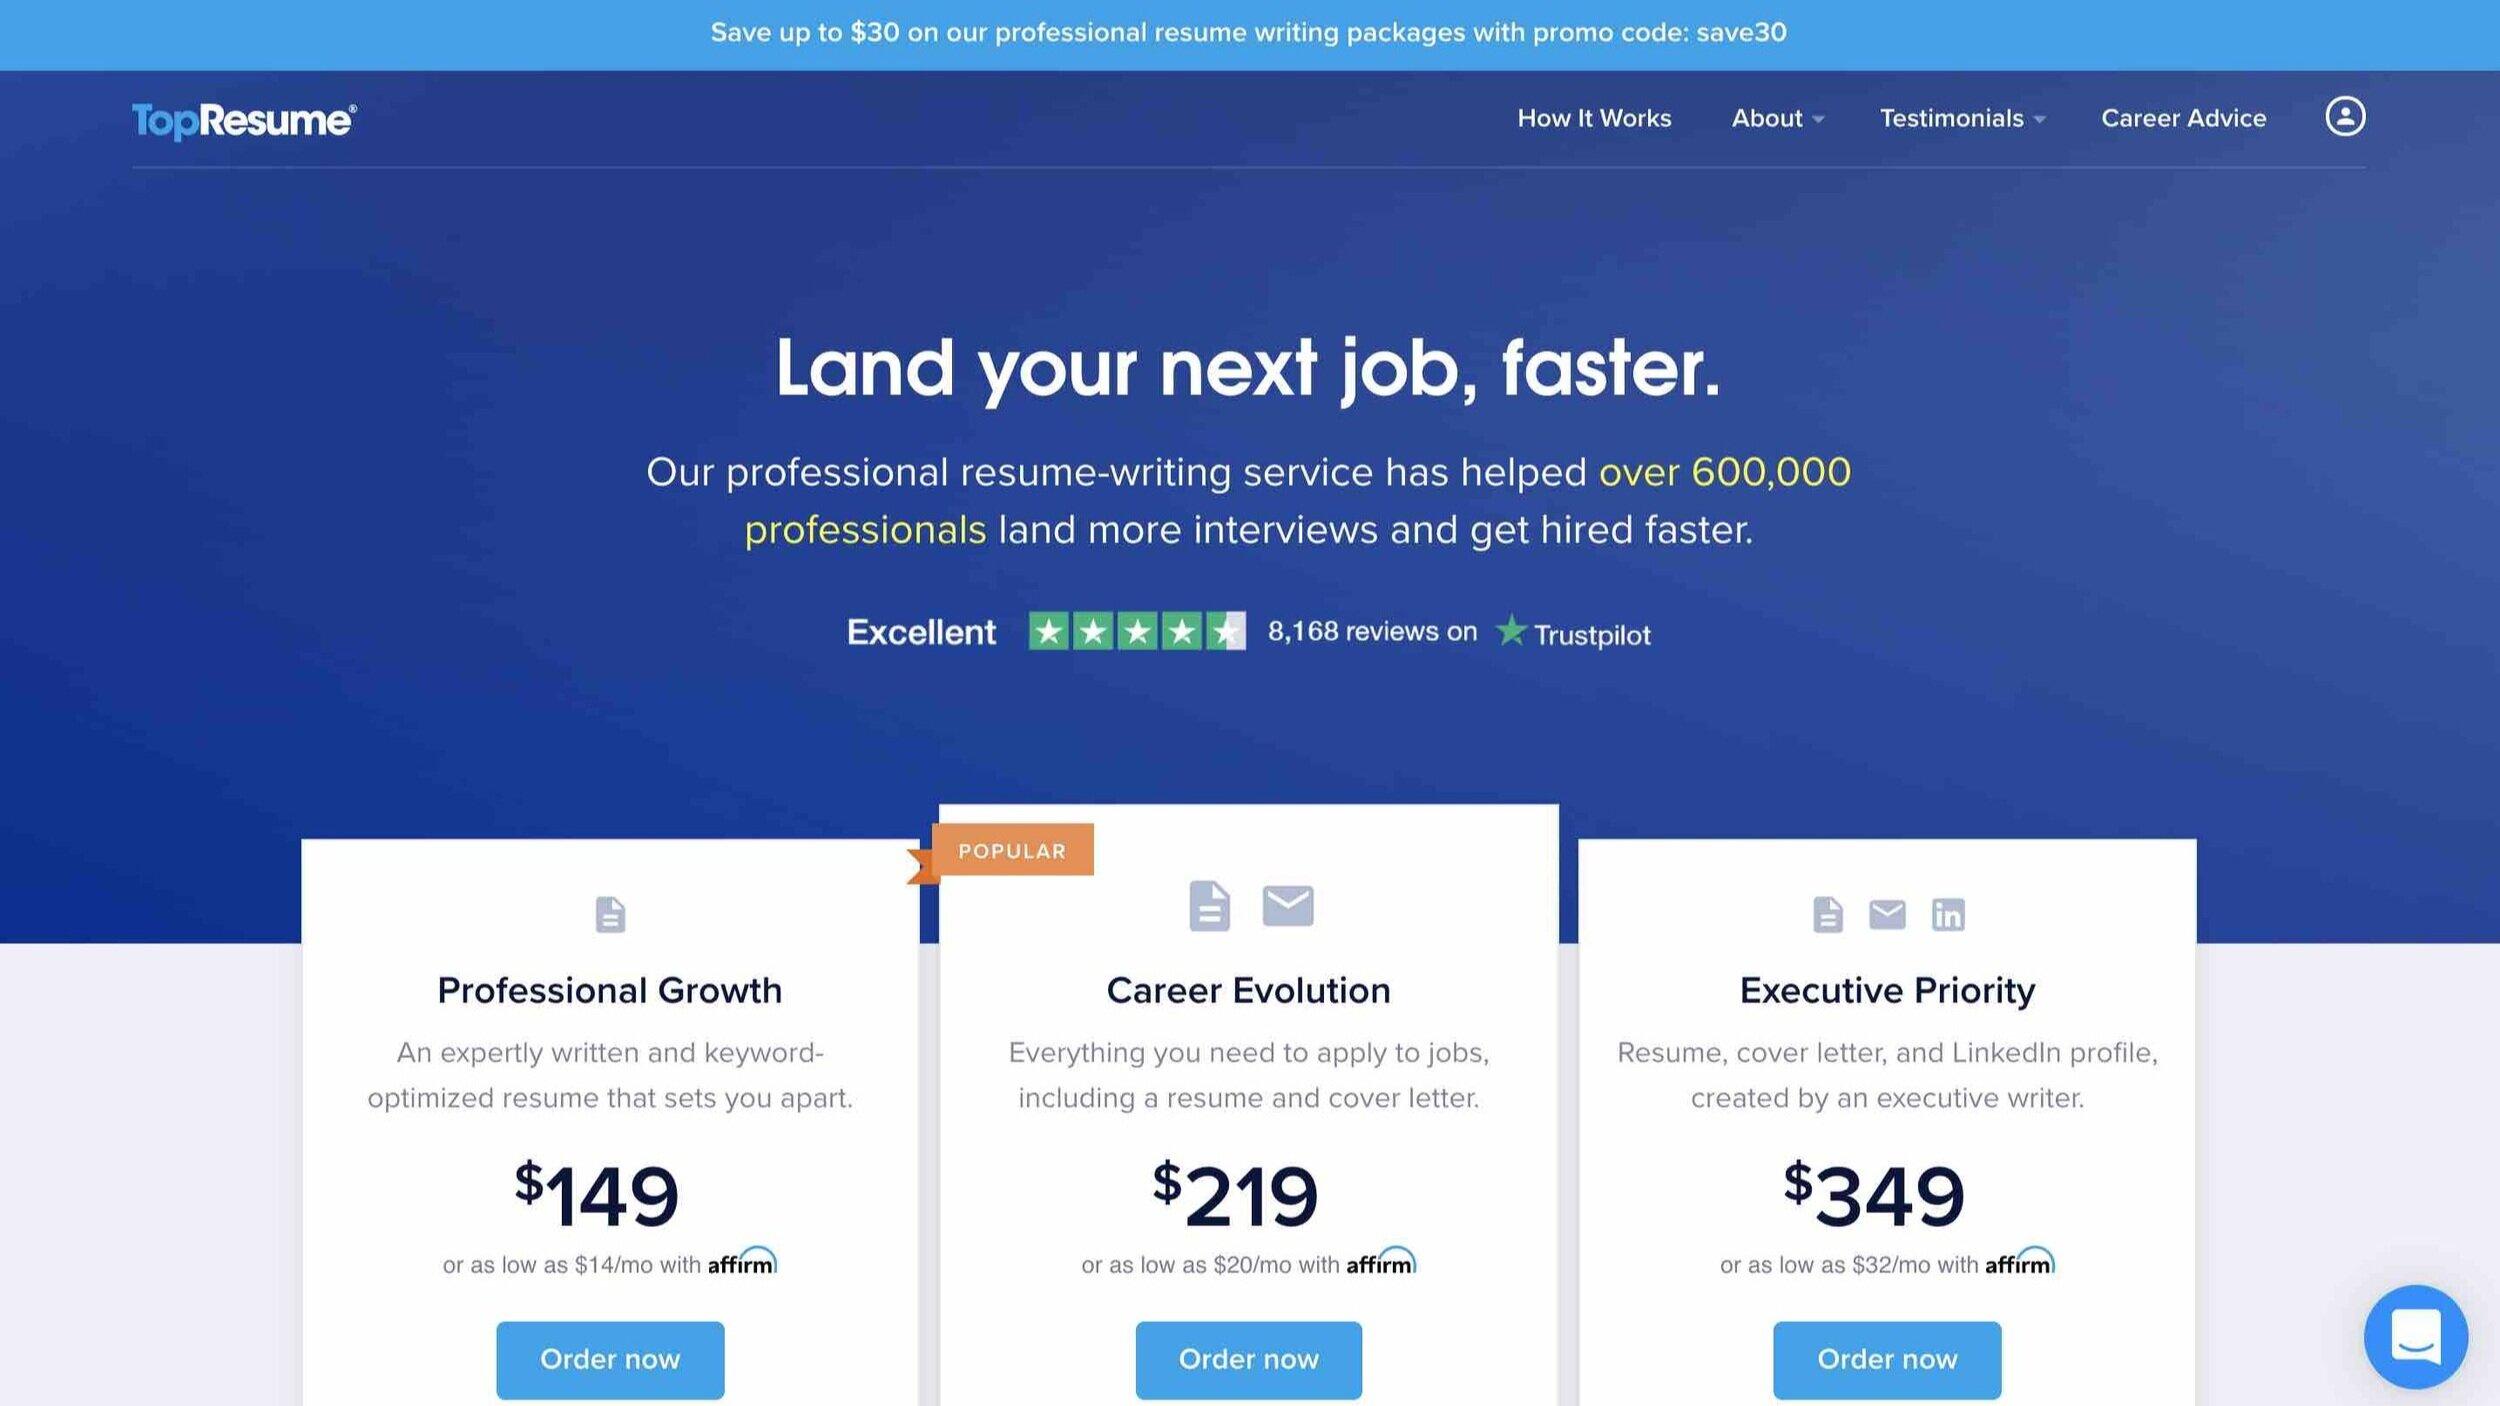 Top Resume LinkedIn profile writing service.jpg